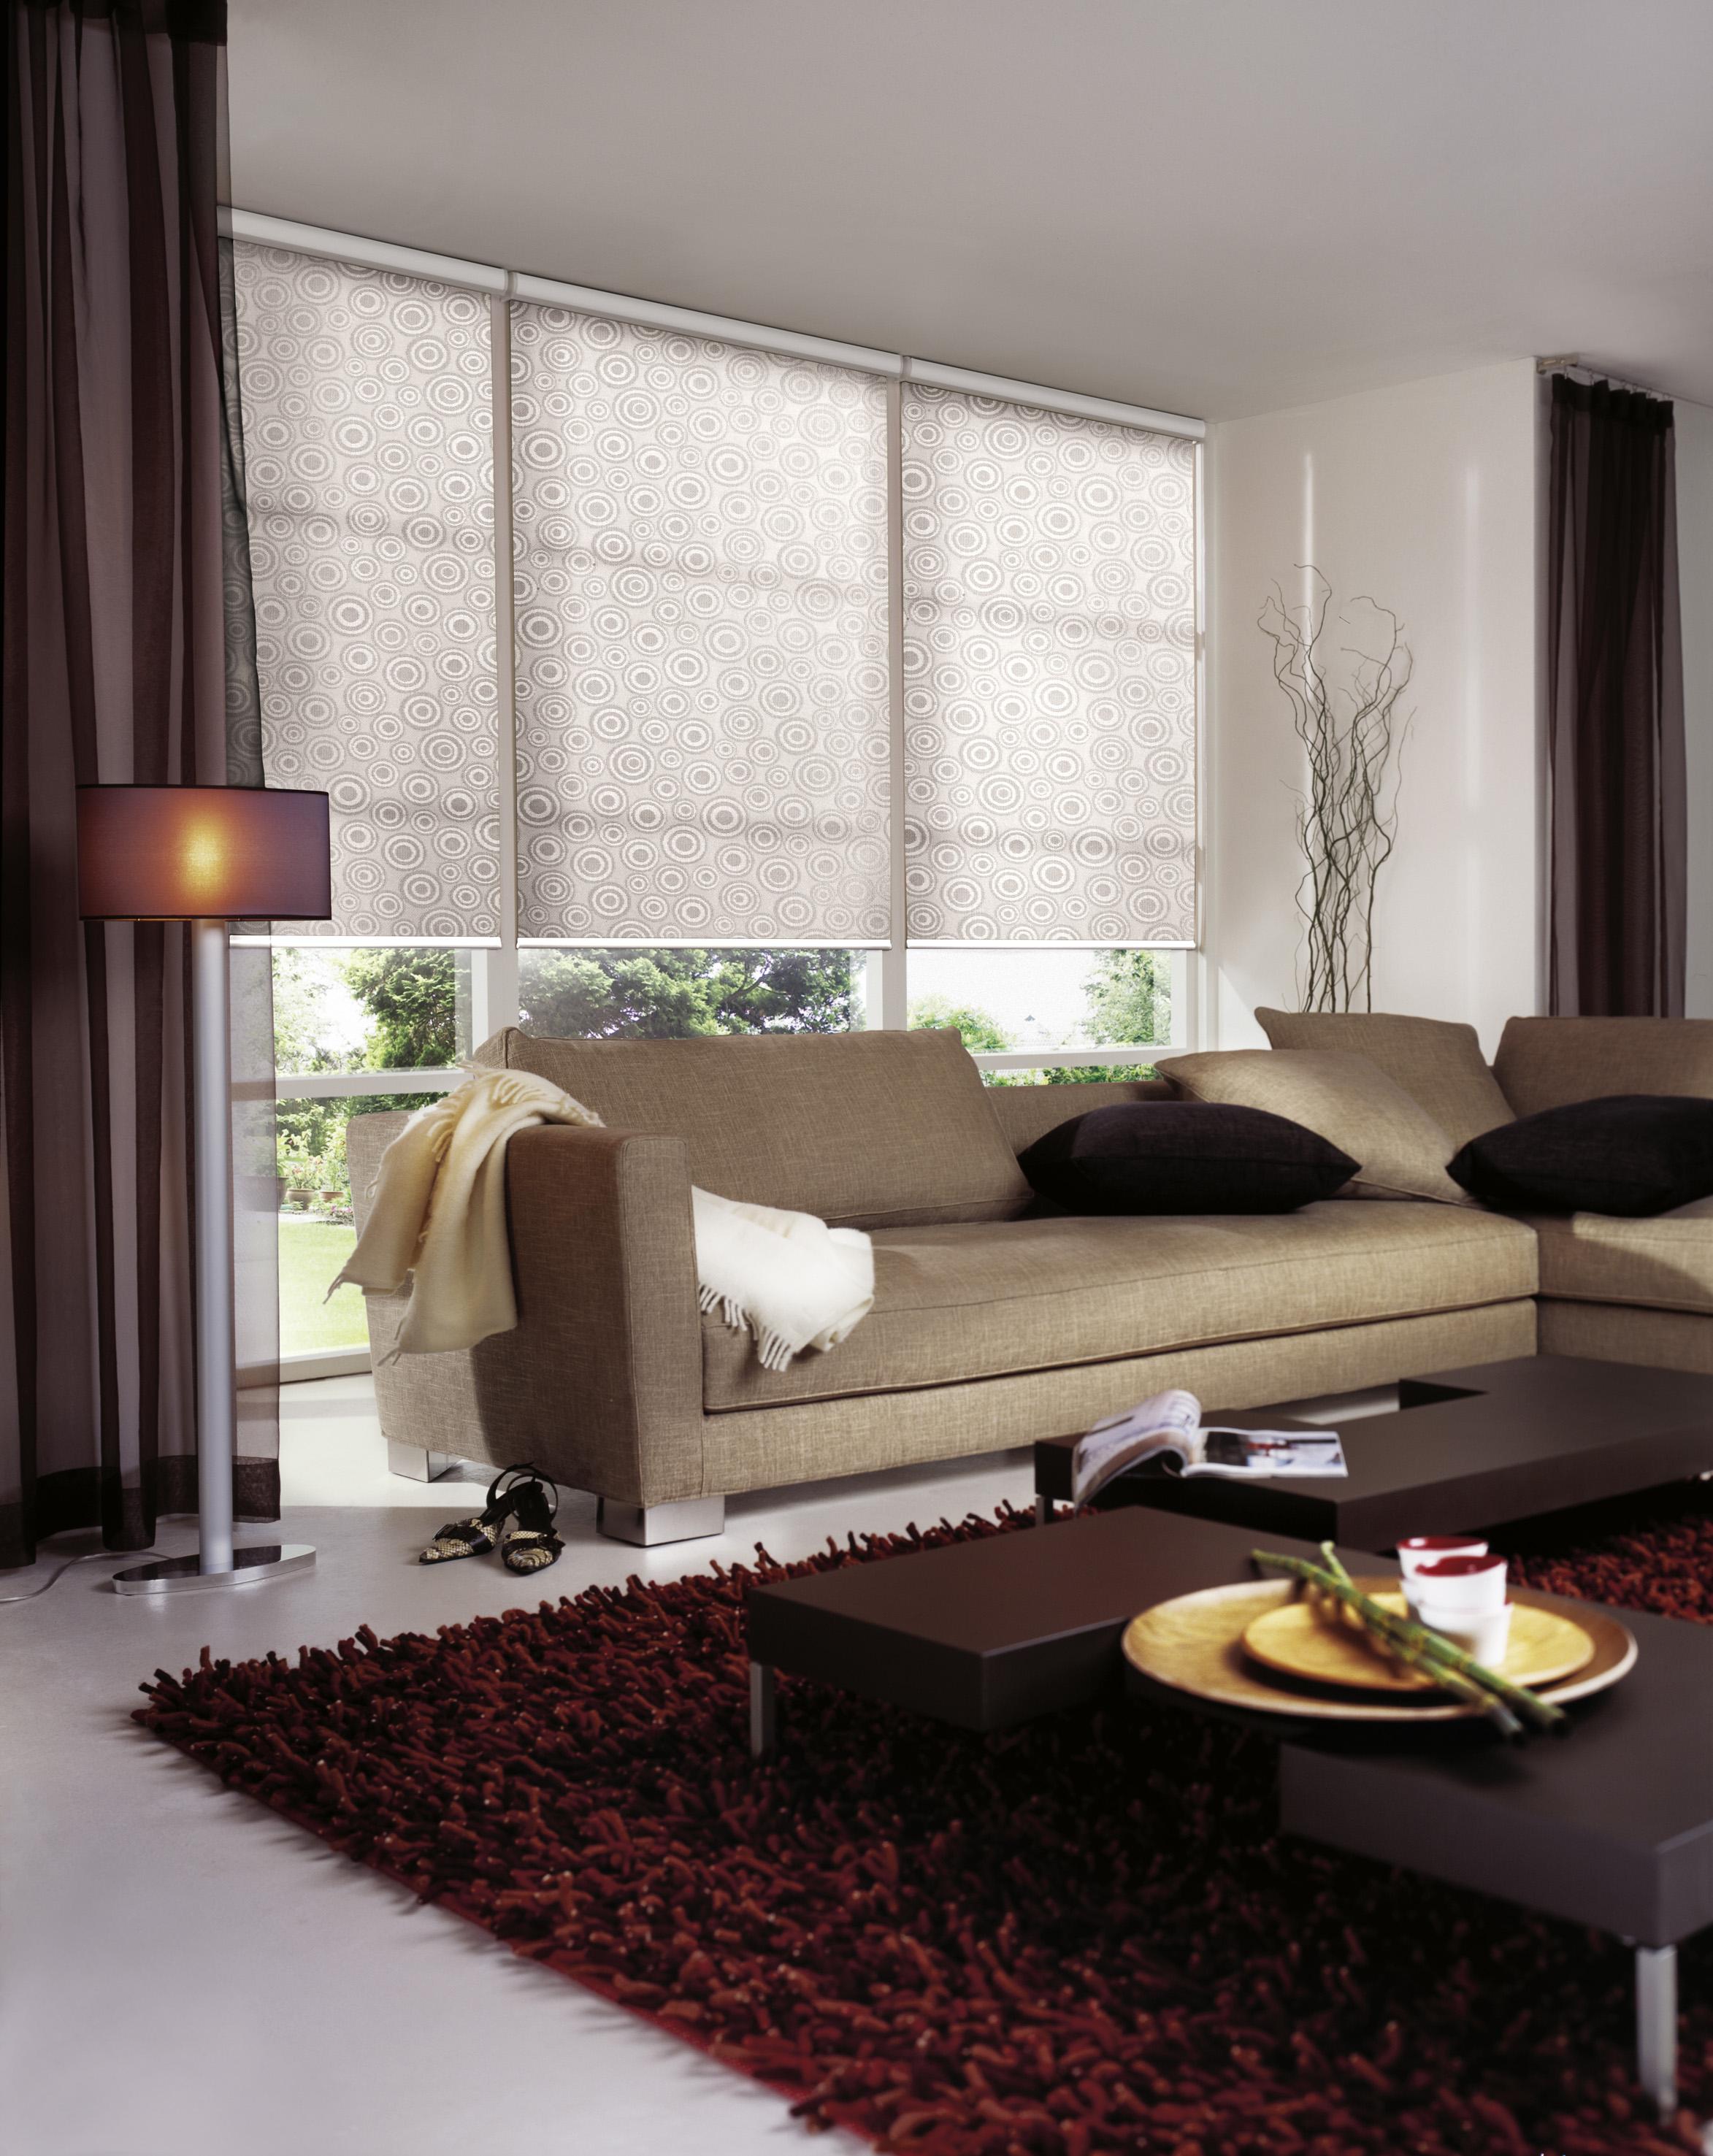 rollos stoffdepot. Black Bedroom Furniture Sets. Home Design Ideas